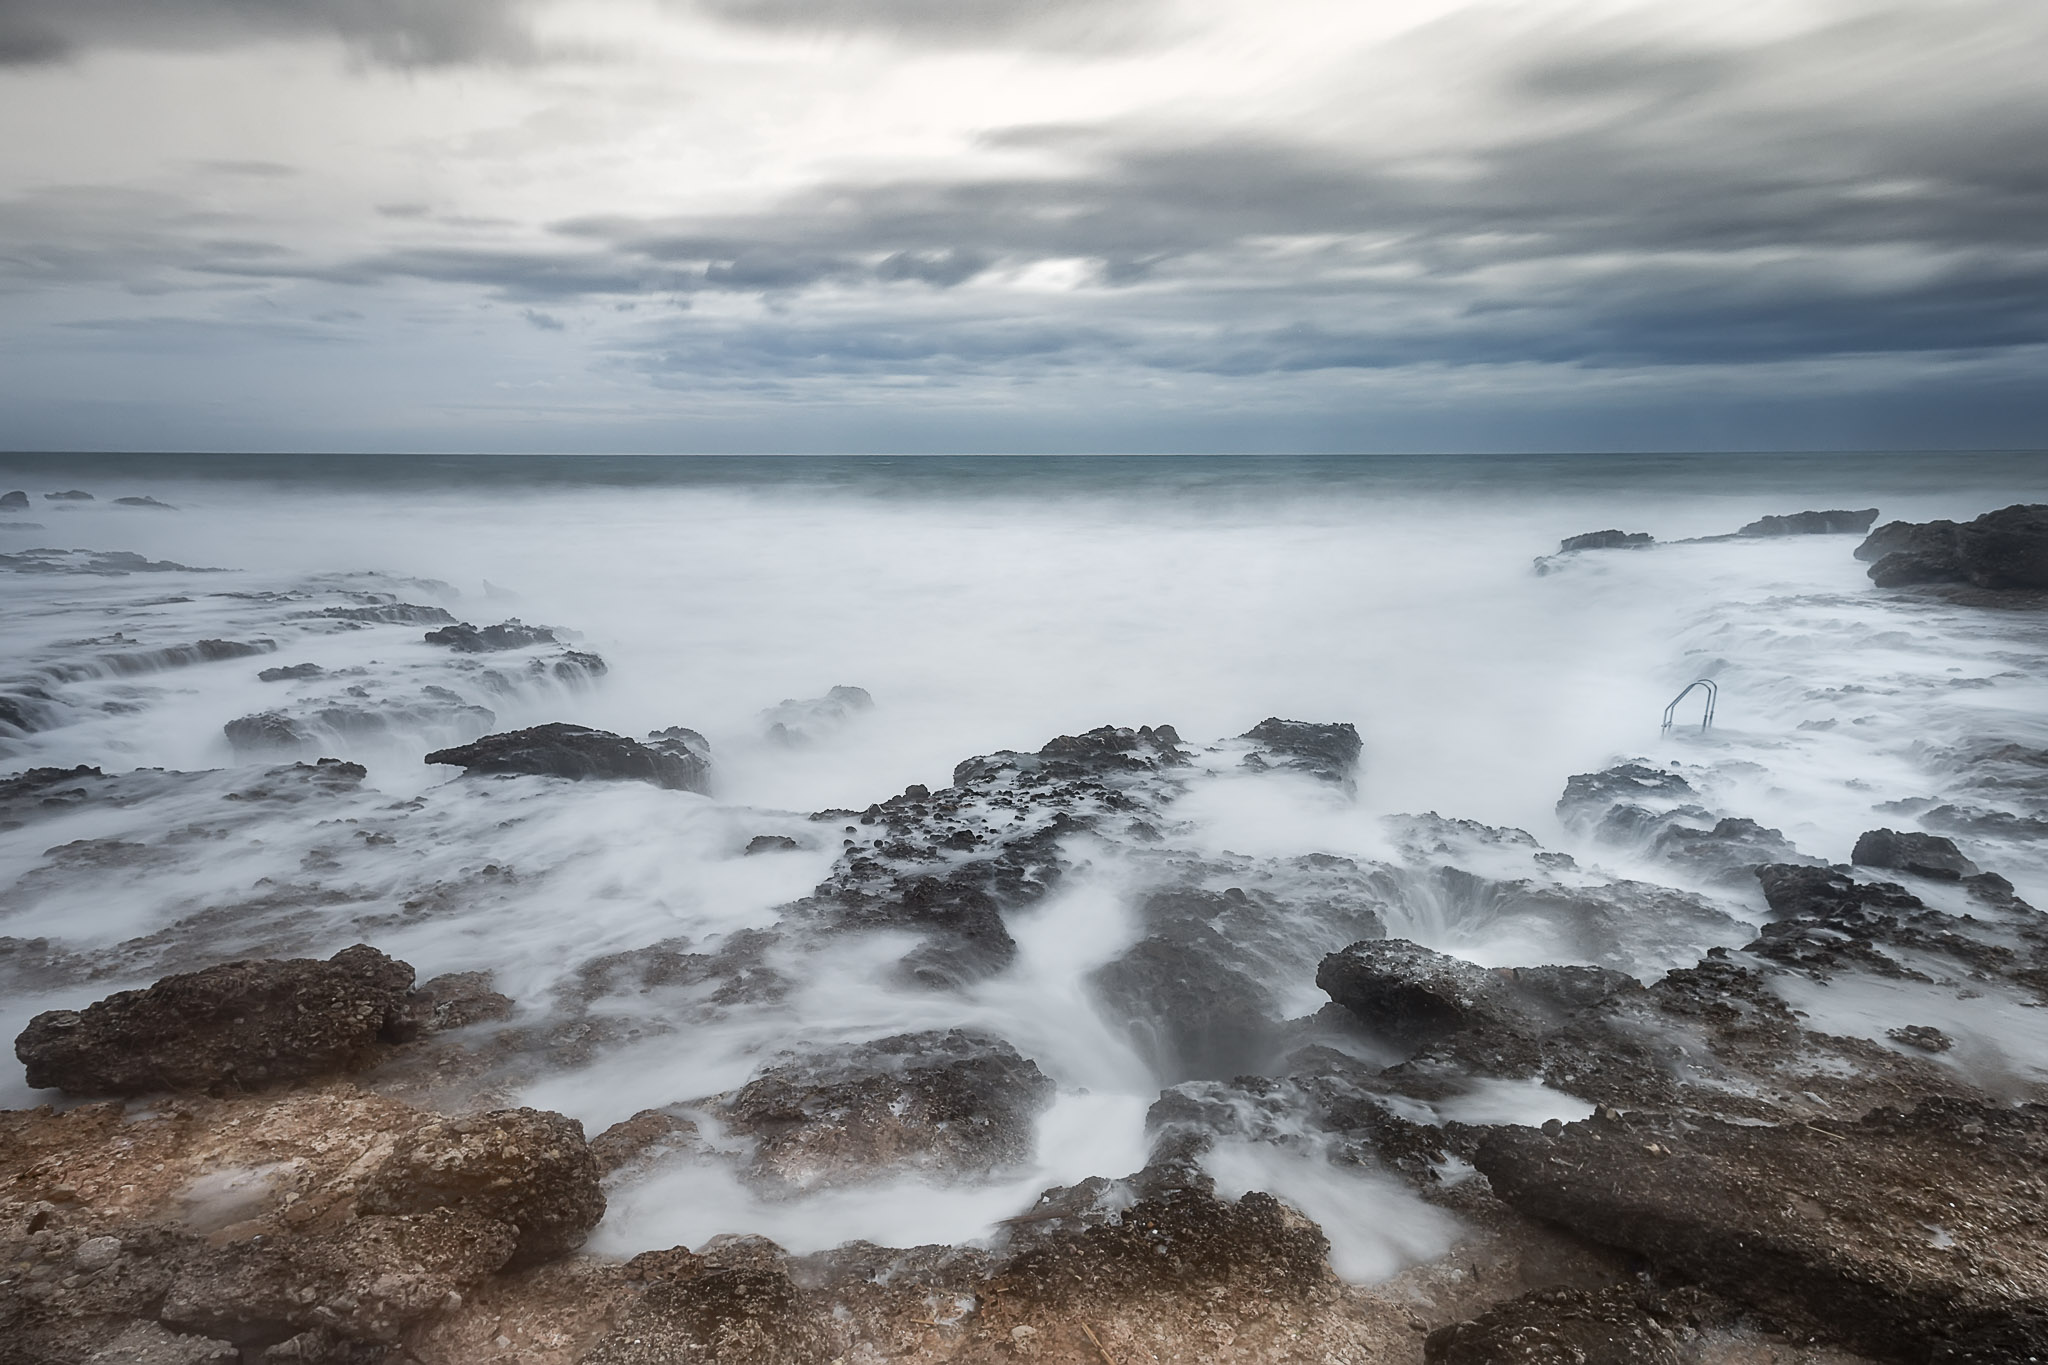 Paisaje de Bufadors, costa de Tarragona, marejada, larga exposición, canon 6D,Danilatorre,danilatorre, Dani Latorre, daniel Latorre